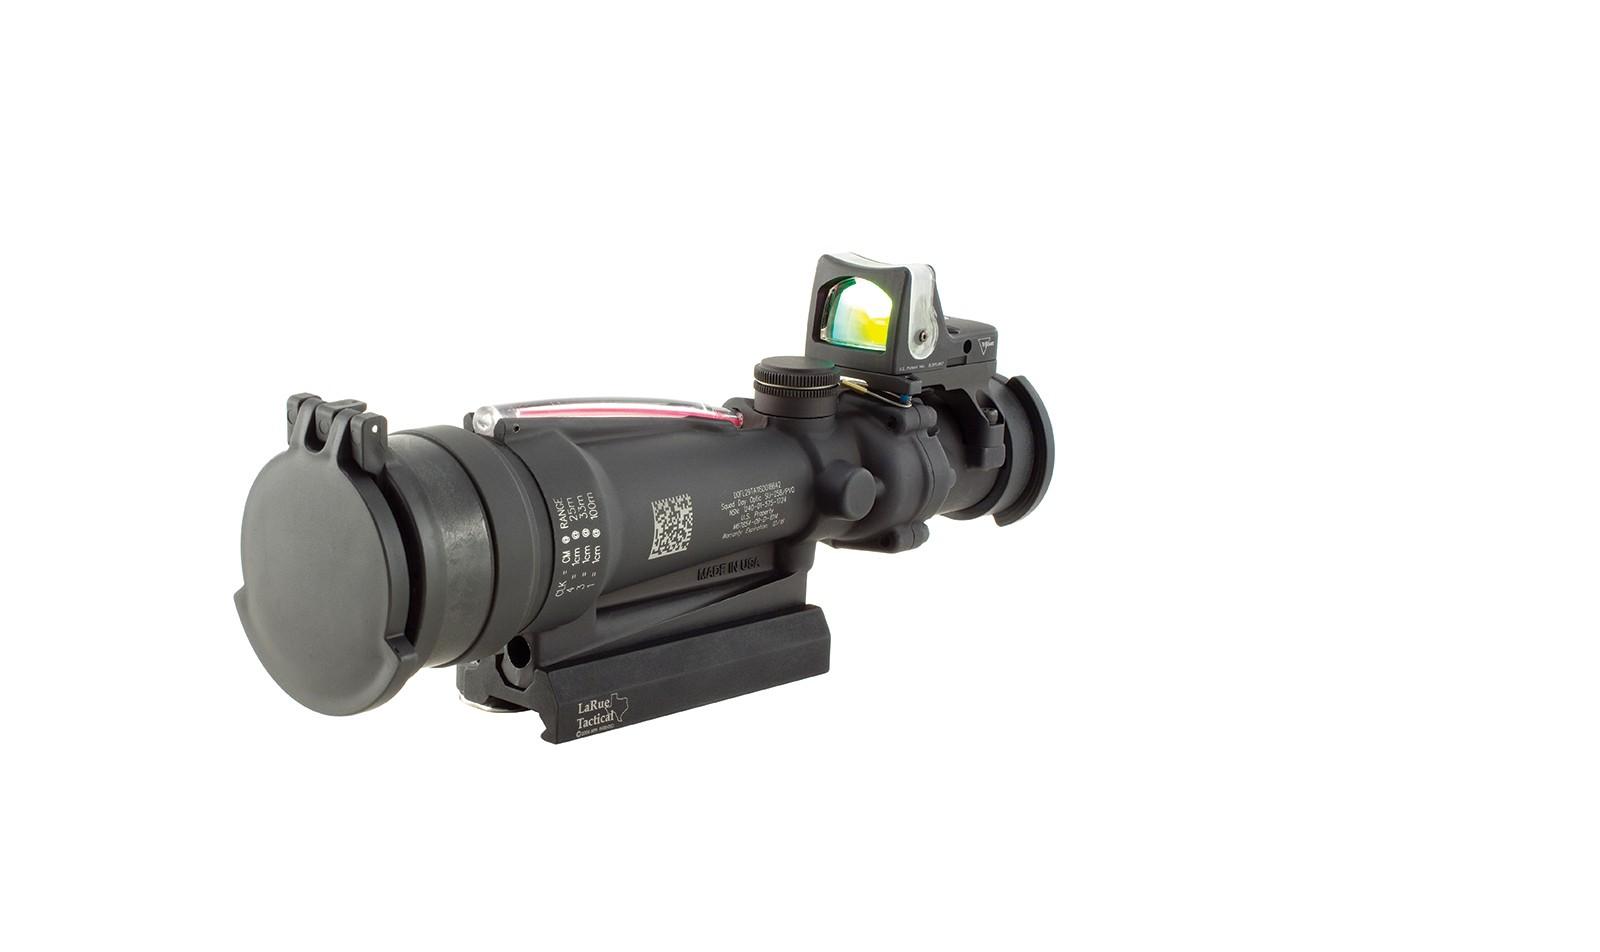 Trijicon ACOG<sup>®</sup> 3.5x35 BAC Riflescope  w/ Trijicon RMR<sup>®</sup> - M249